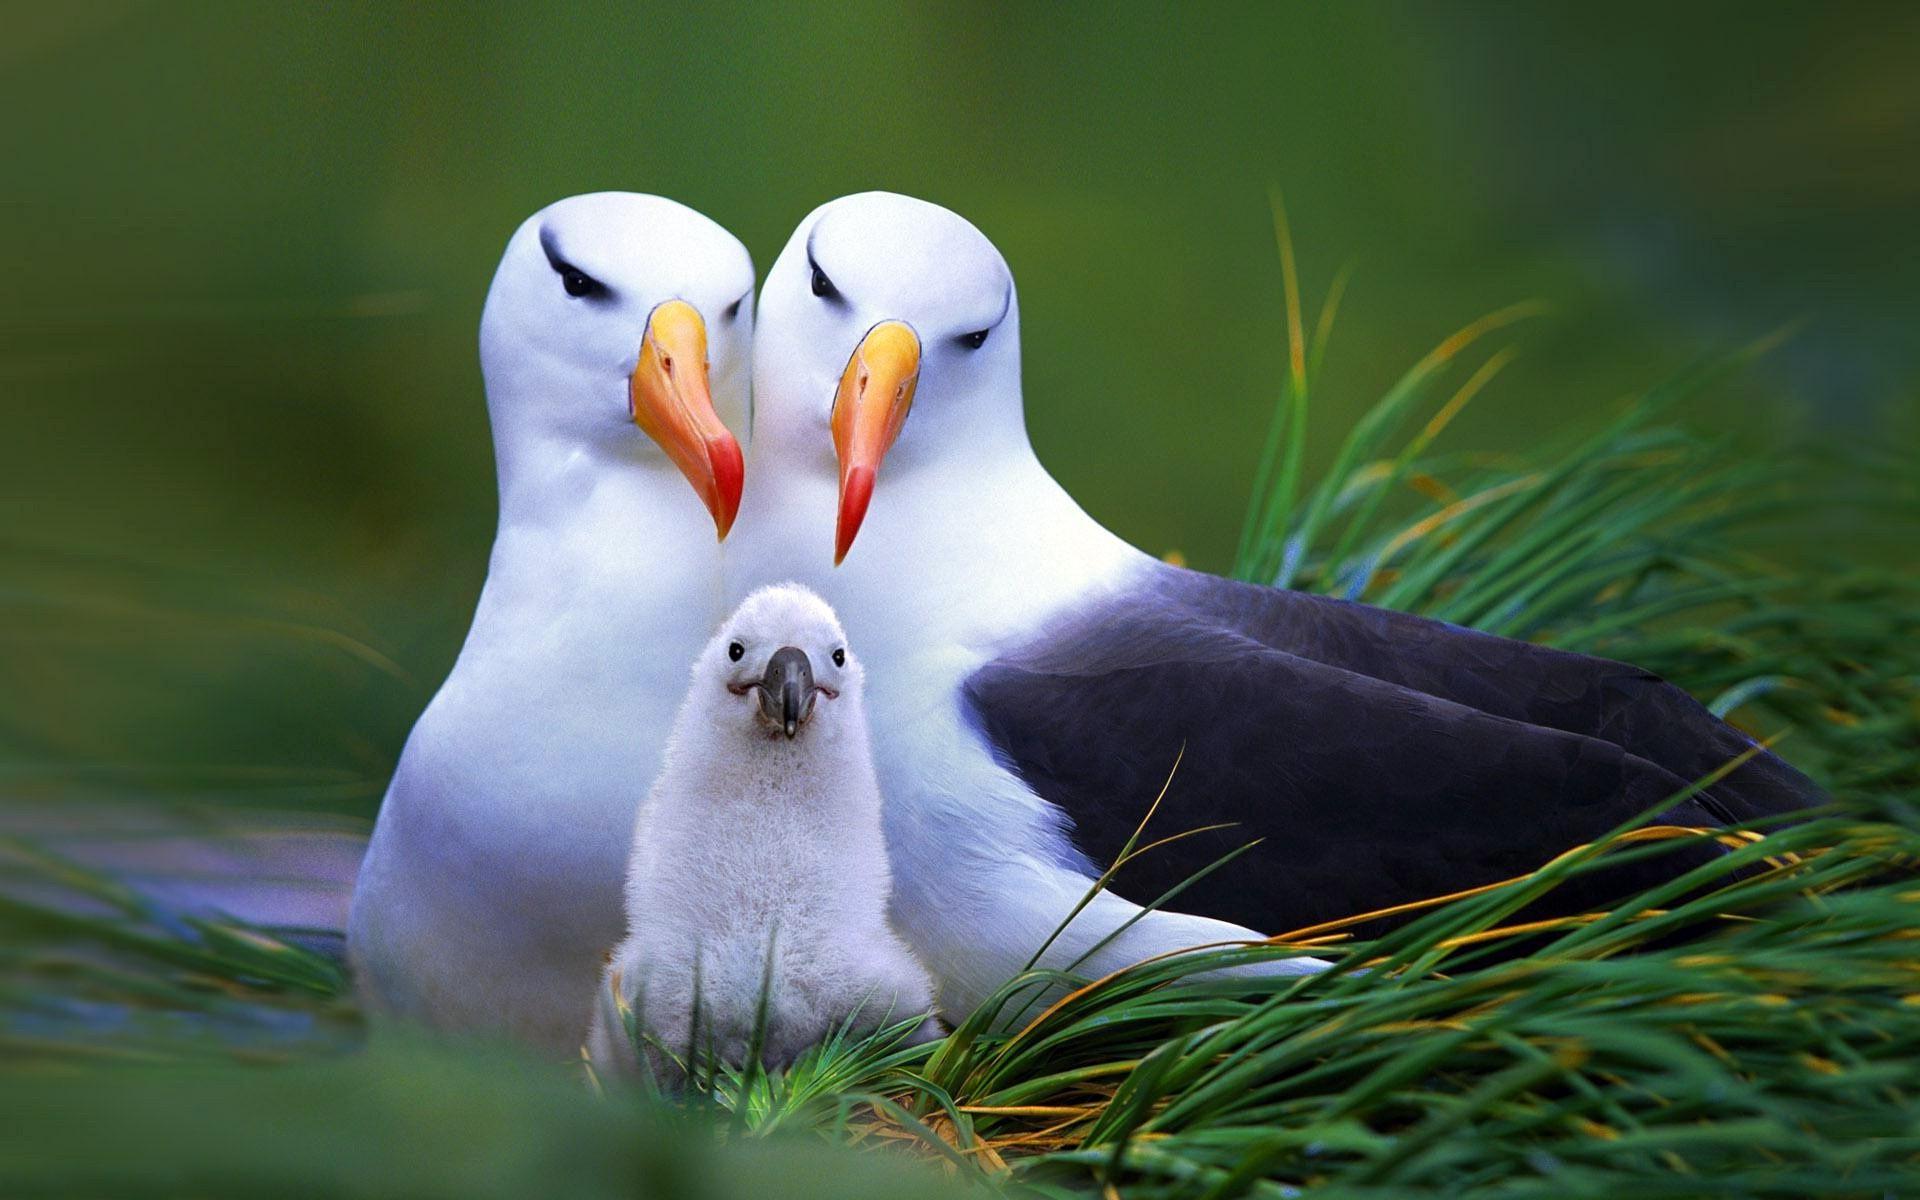 wallpaper : 1920x1200 px, baby animals, birds, seagulls 1920x1200